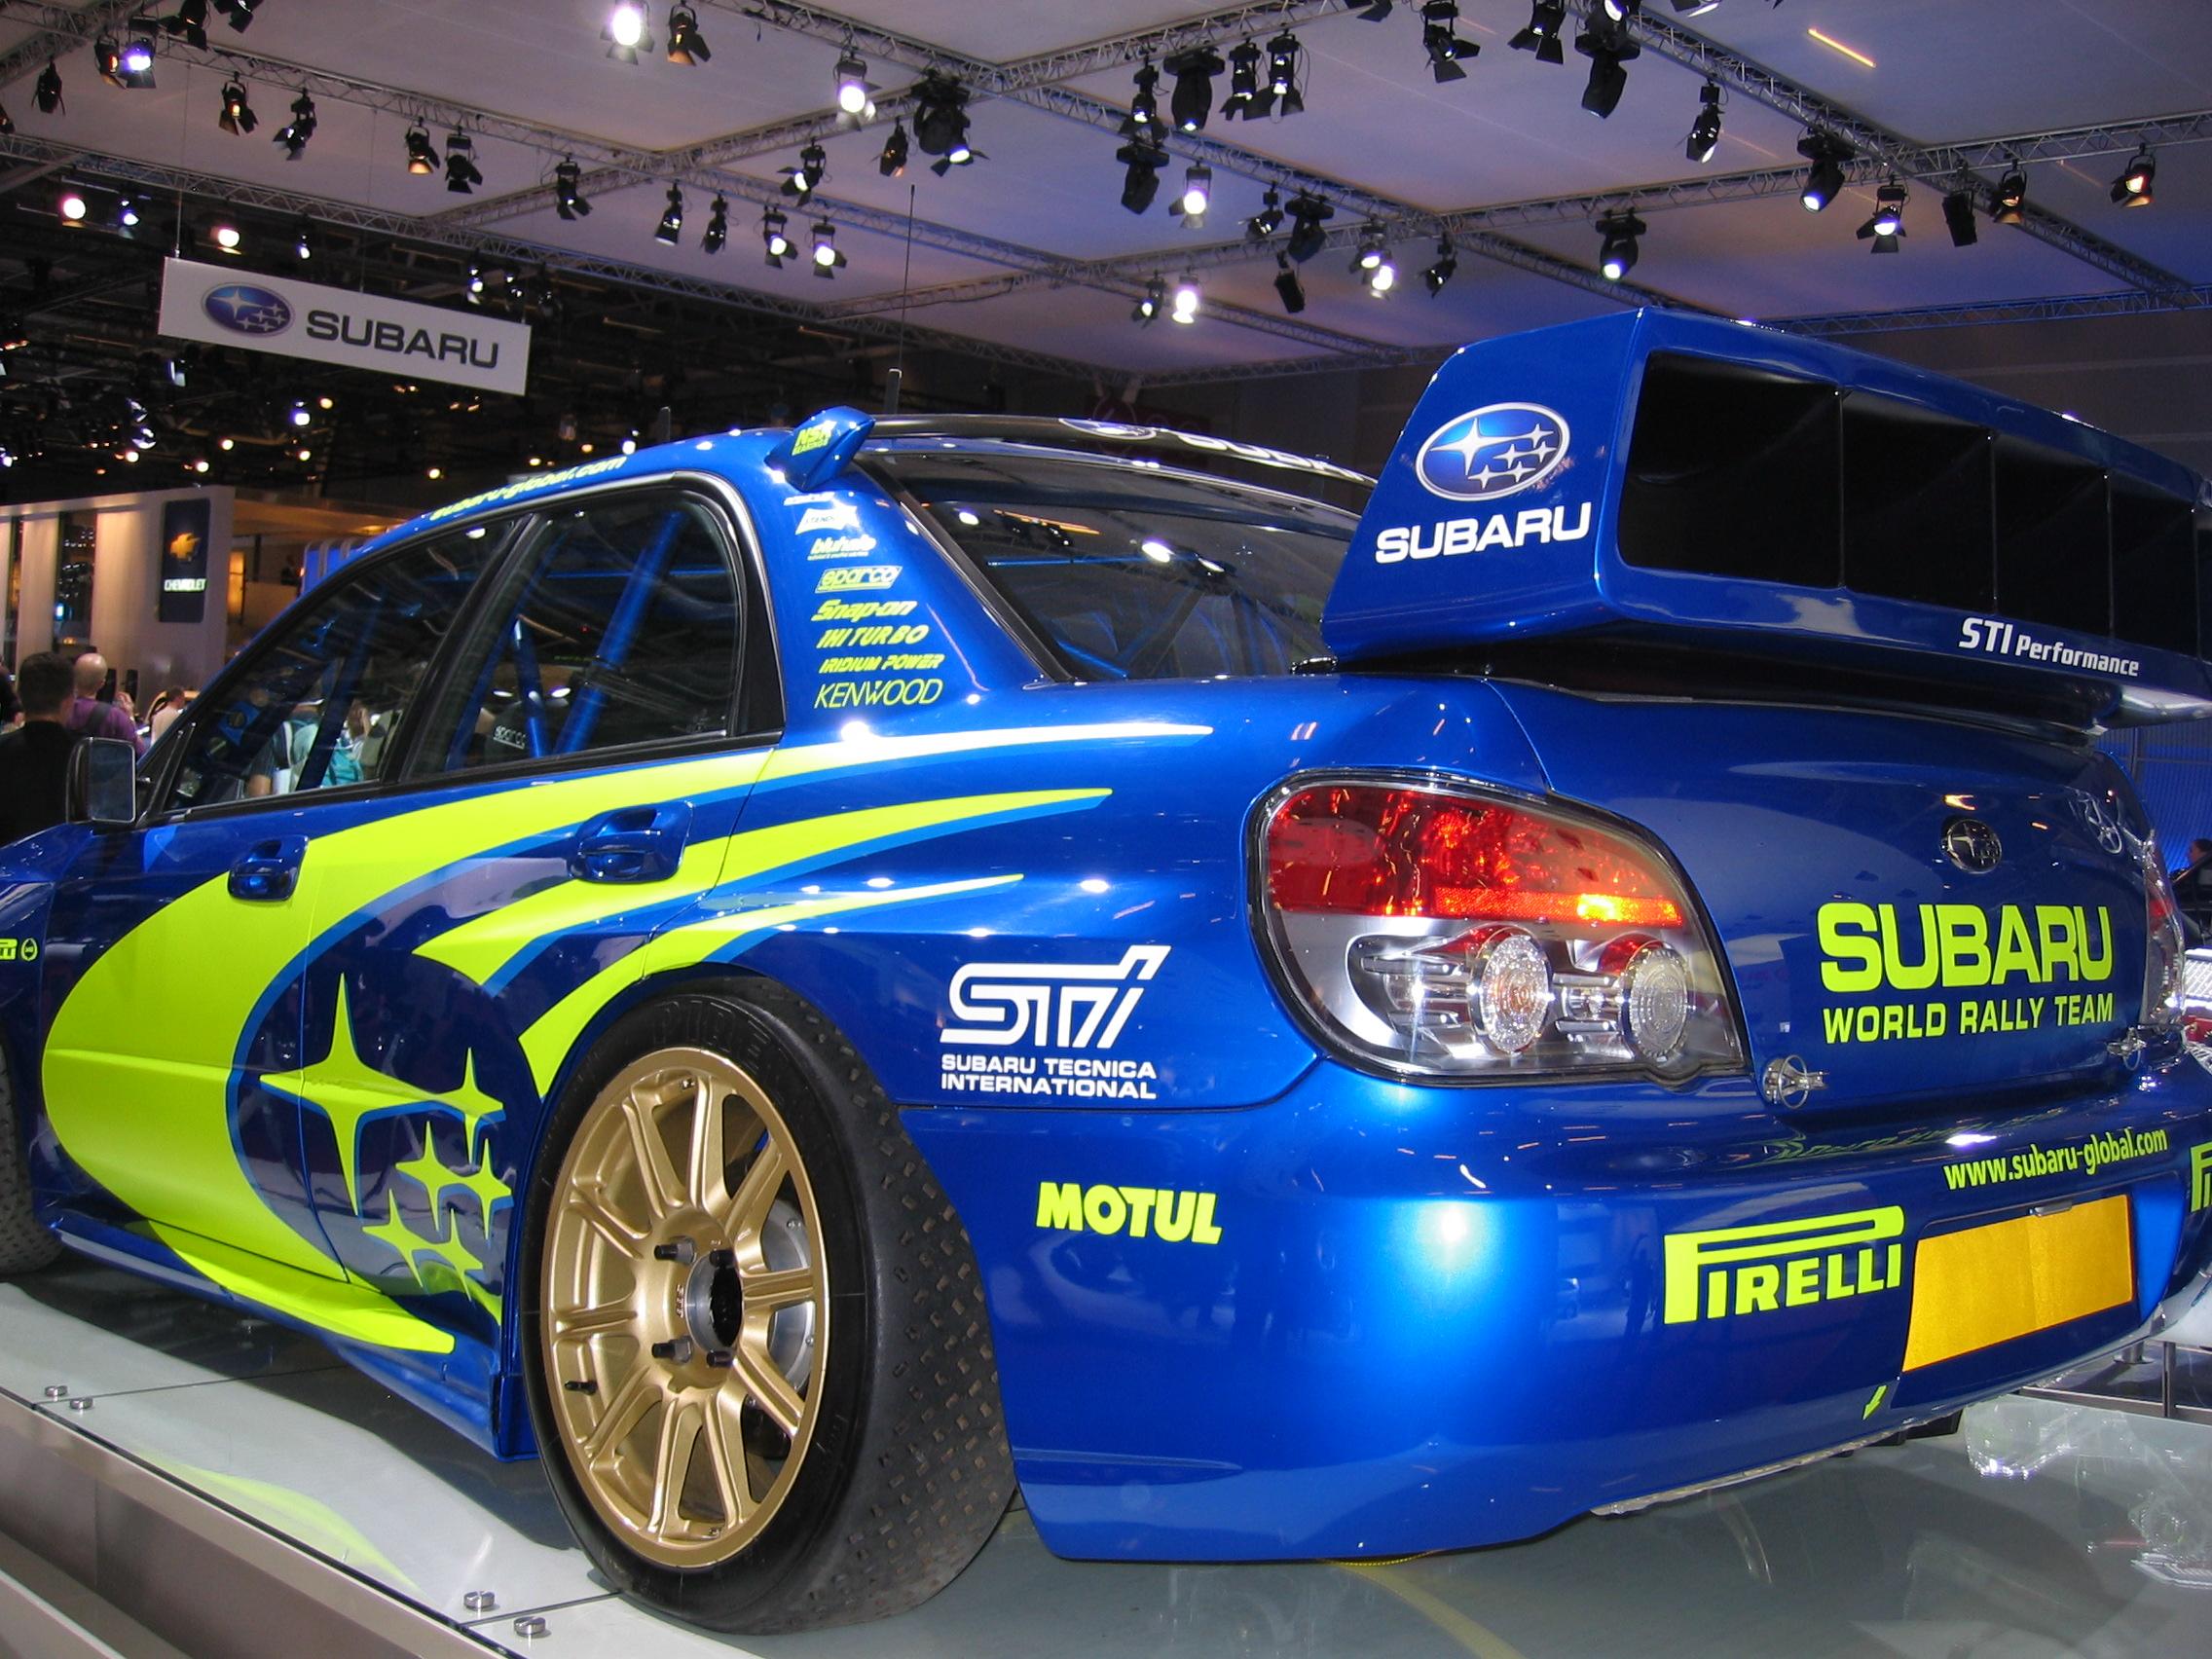 Ken Block Cars Wallpaper File Subaru Wrx Sti Rally Car At The 2006 Paris Auto Show